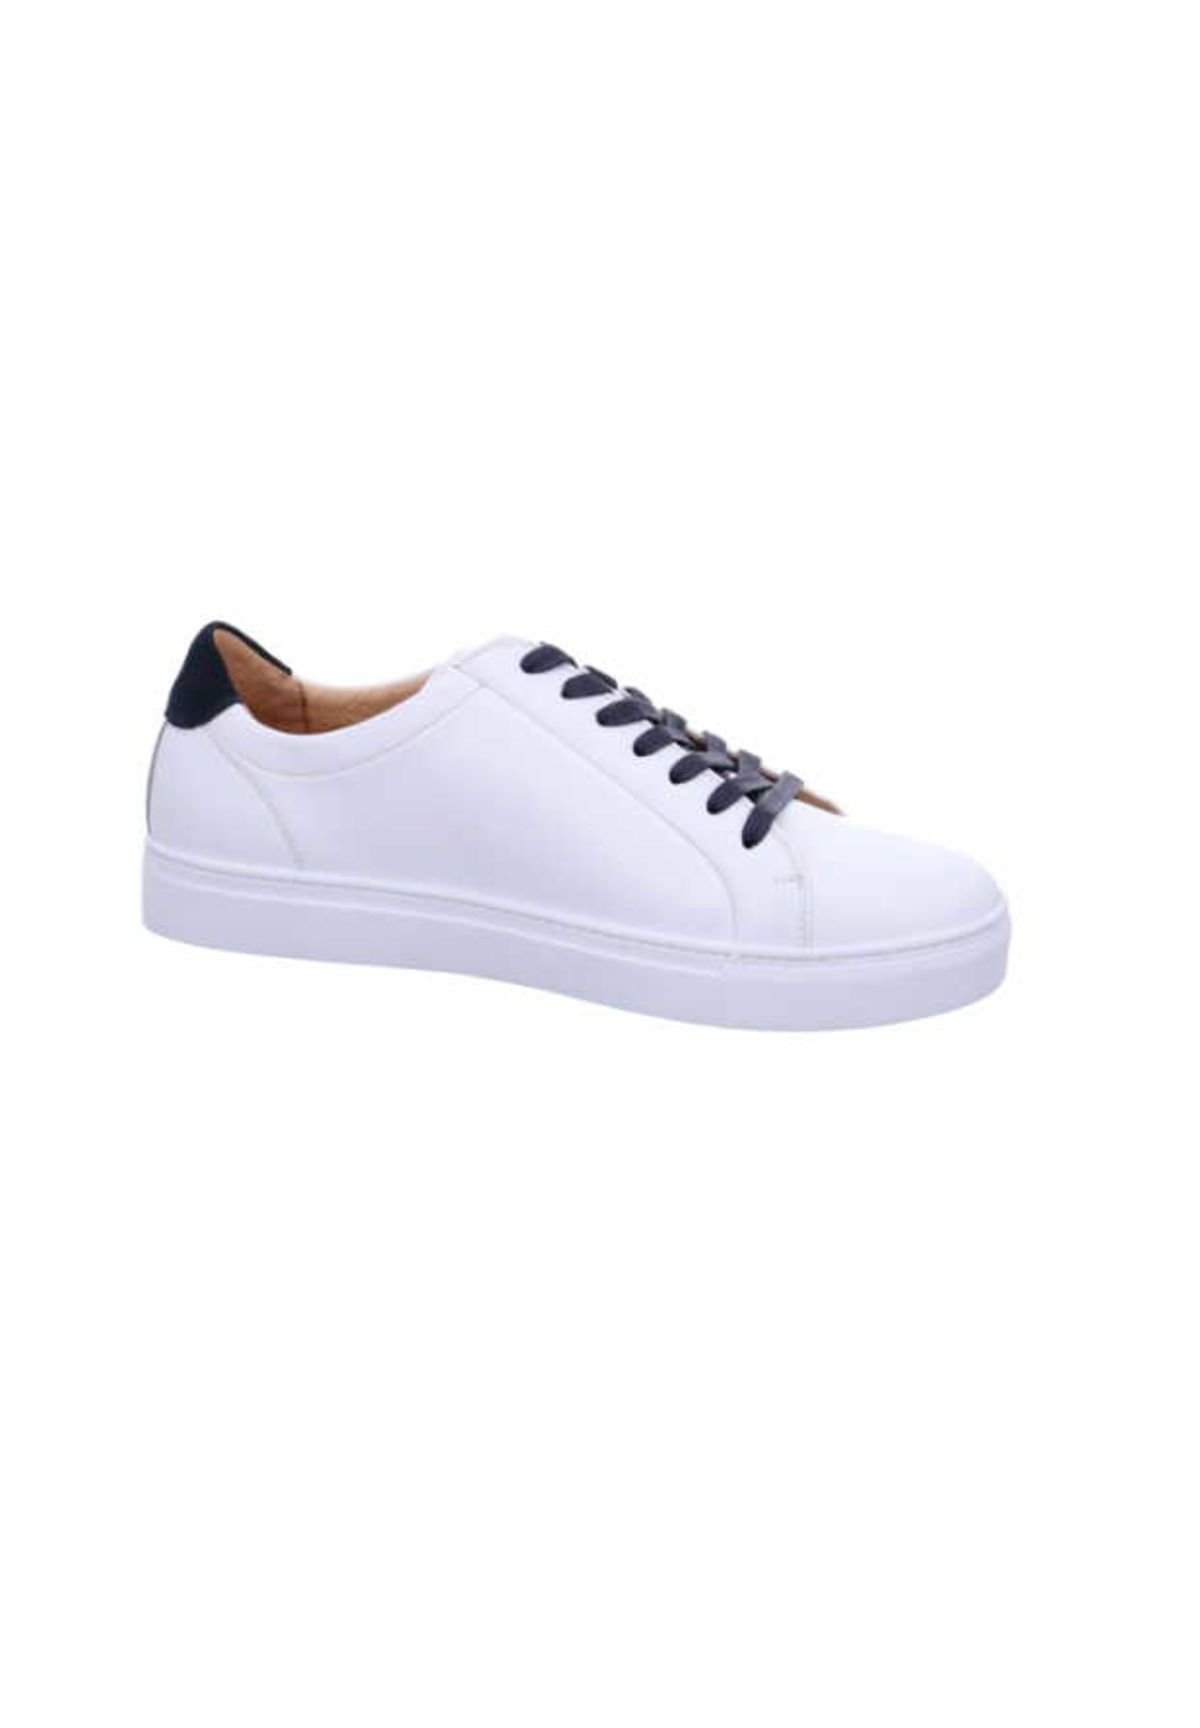 Digel Sneaker low - weiß - Herrenschuhe nwS2V